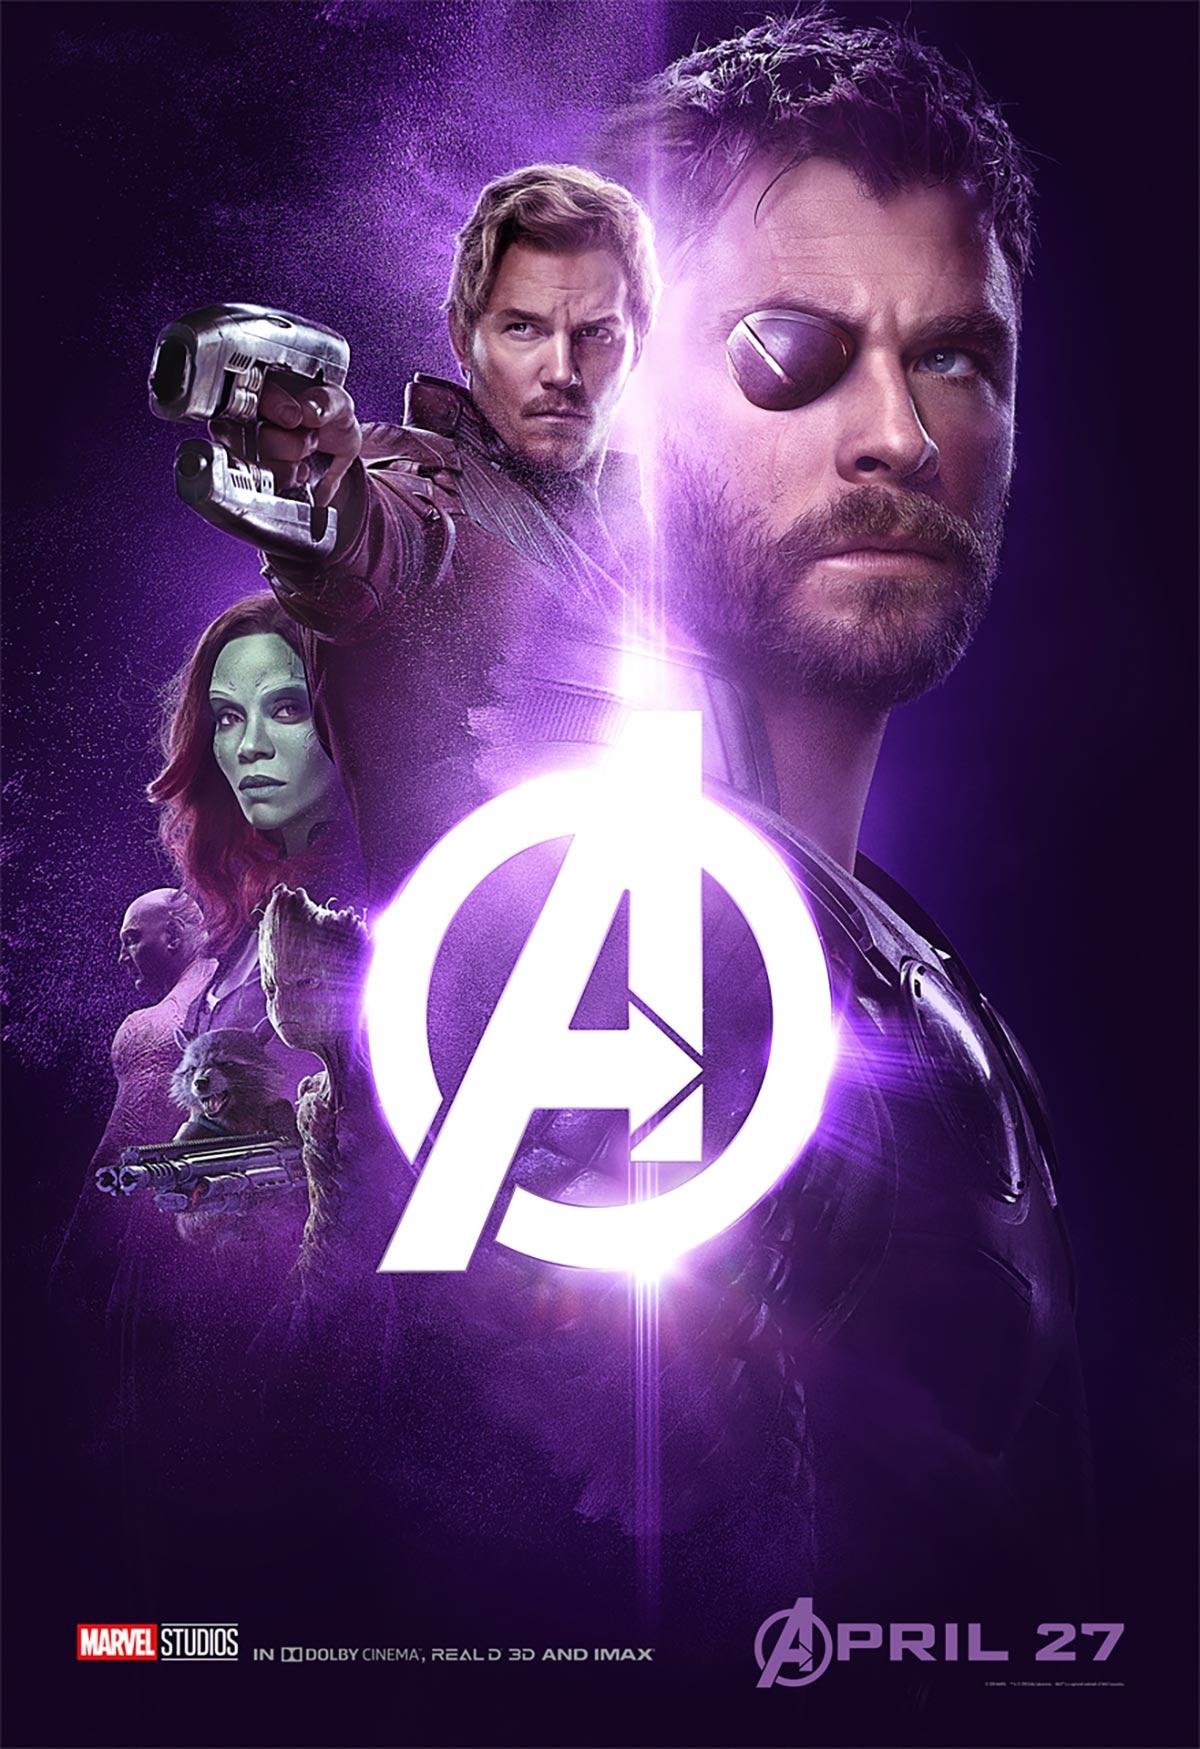 Avengers Infinity War 2018 Poster 8 Trailer Addict